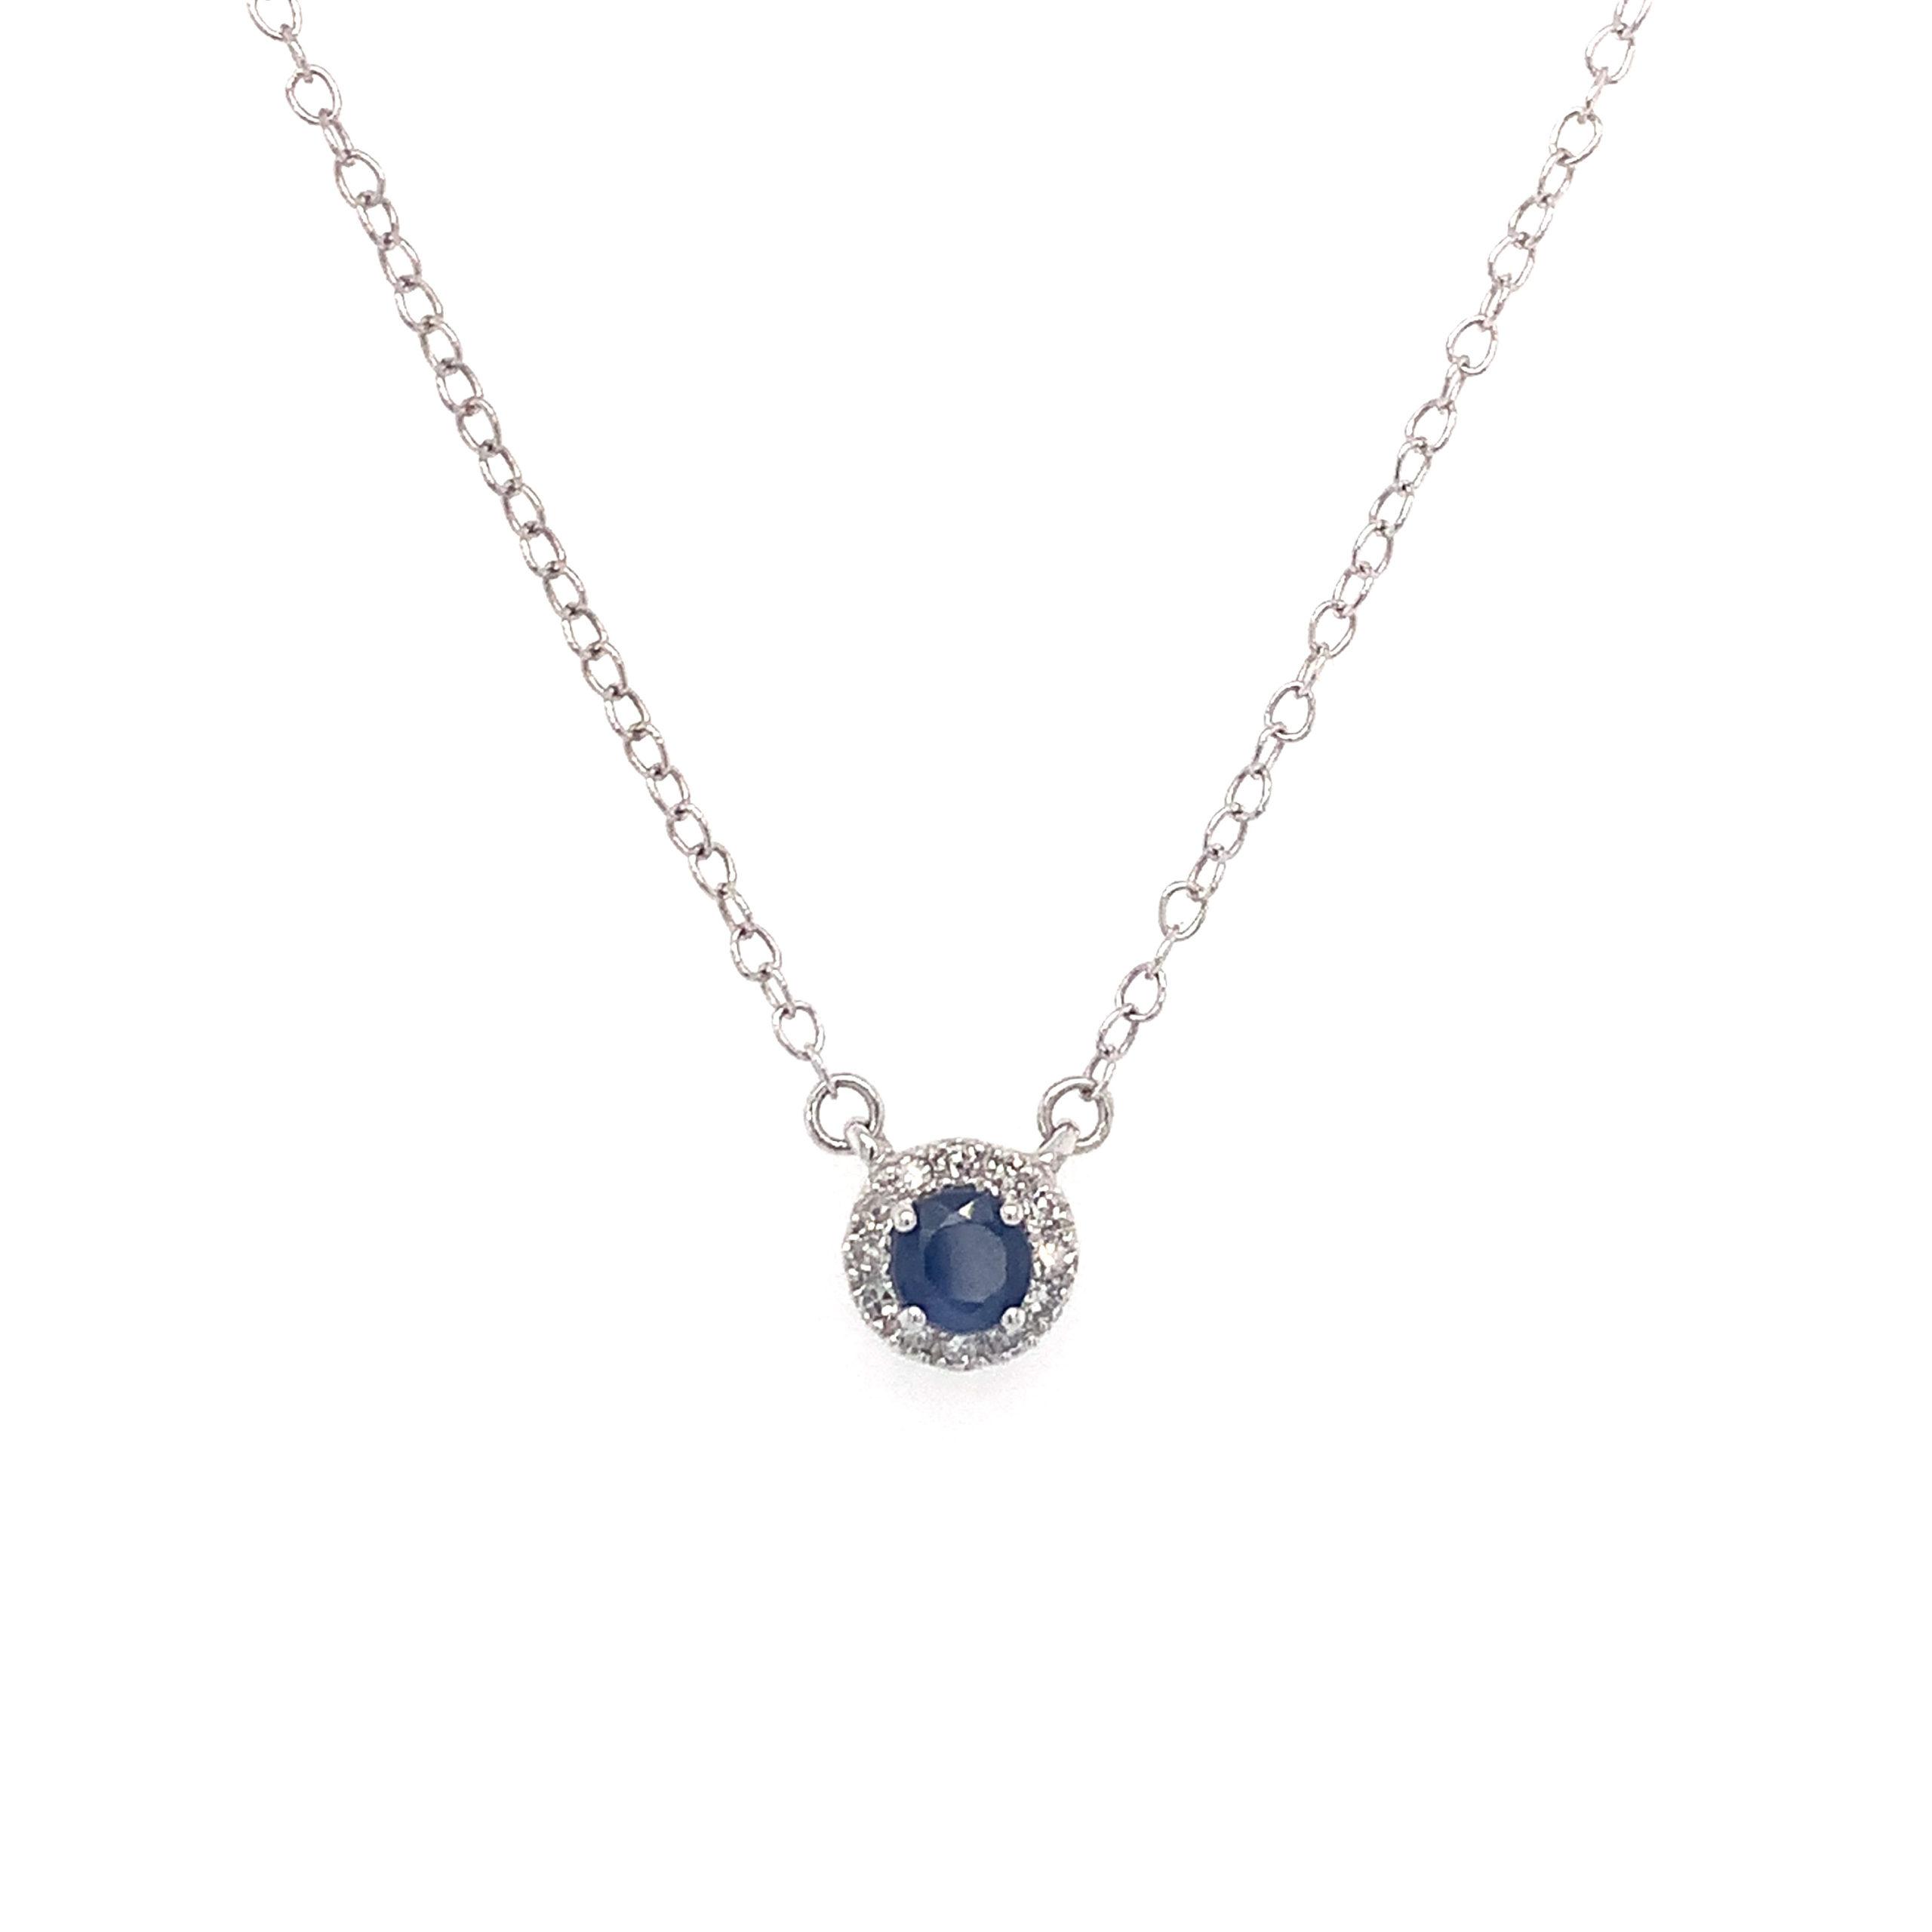 White Gold Sapphire Pendant Necklace